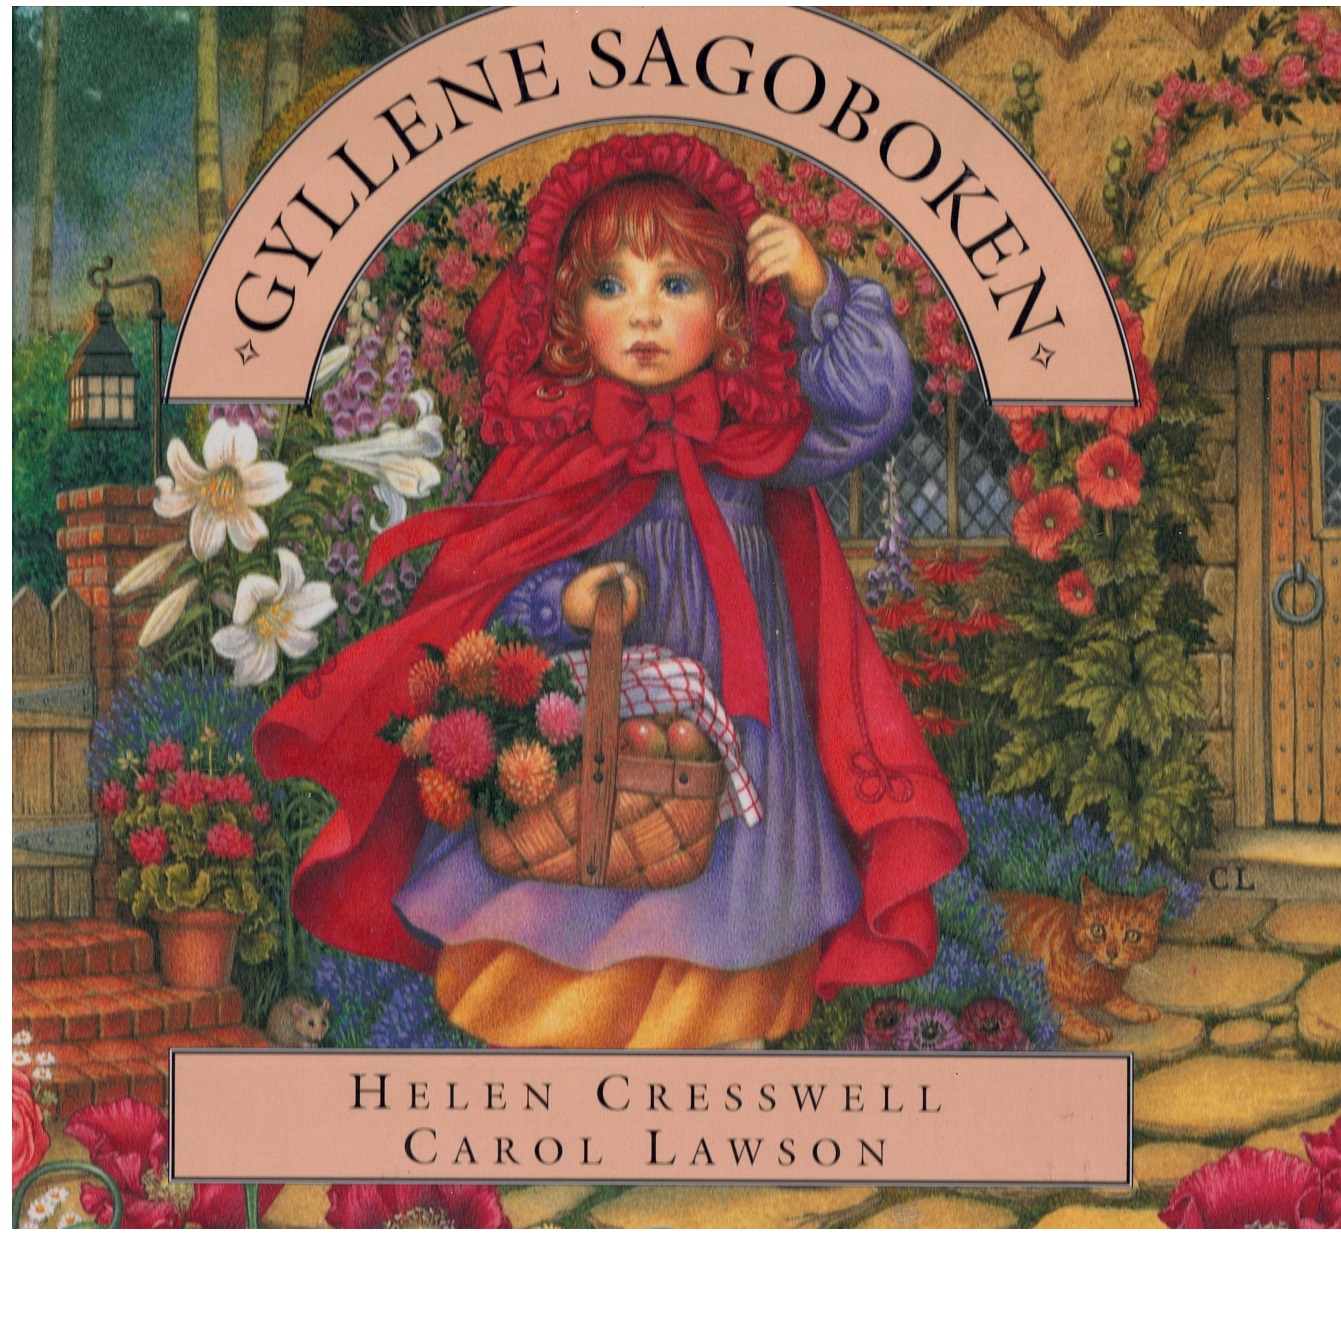 Gyllene sagoboken - Cresswell, Helen och Lawson, Carol